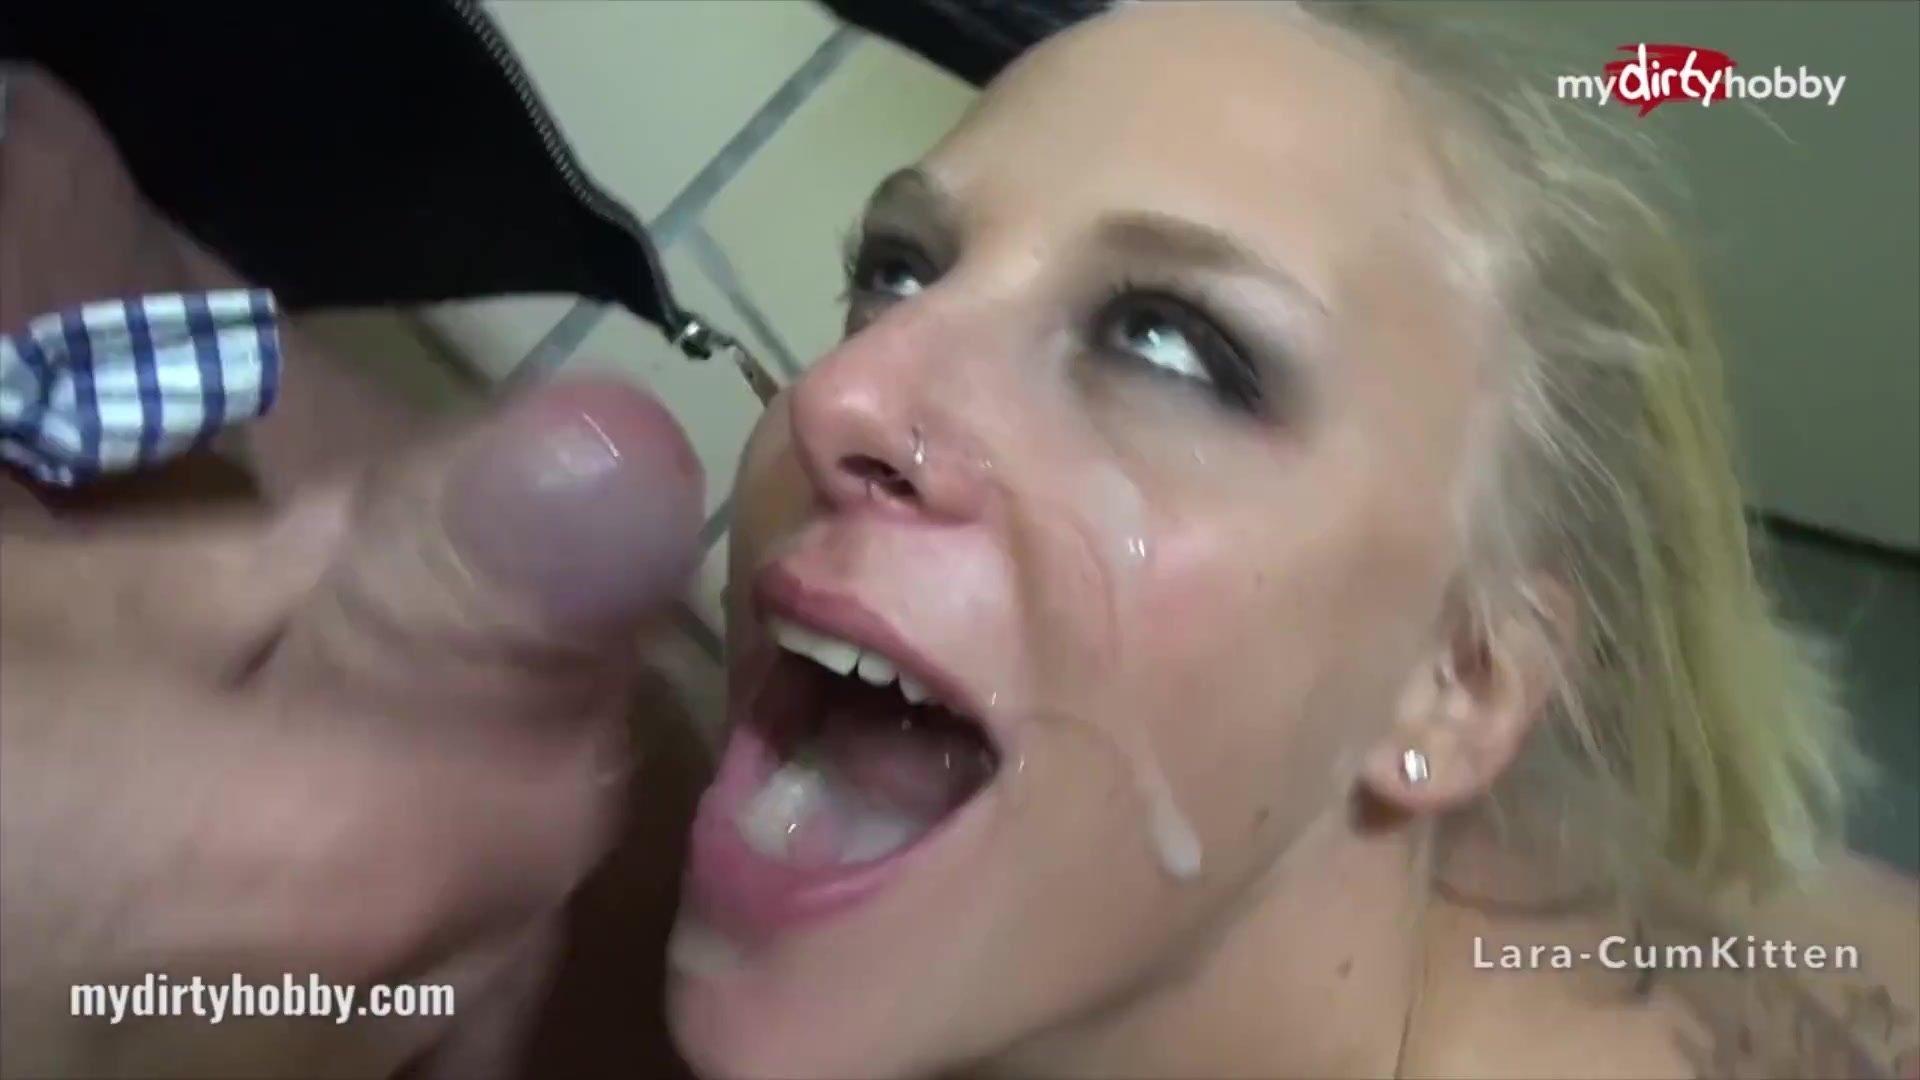 MyDirtyHobby - Public bathroom fuck ends with a huge facial